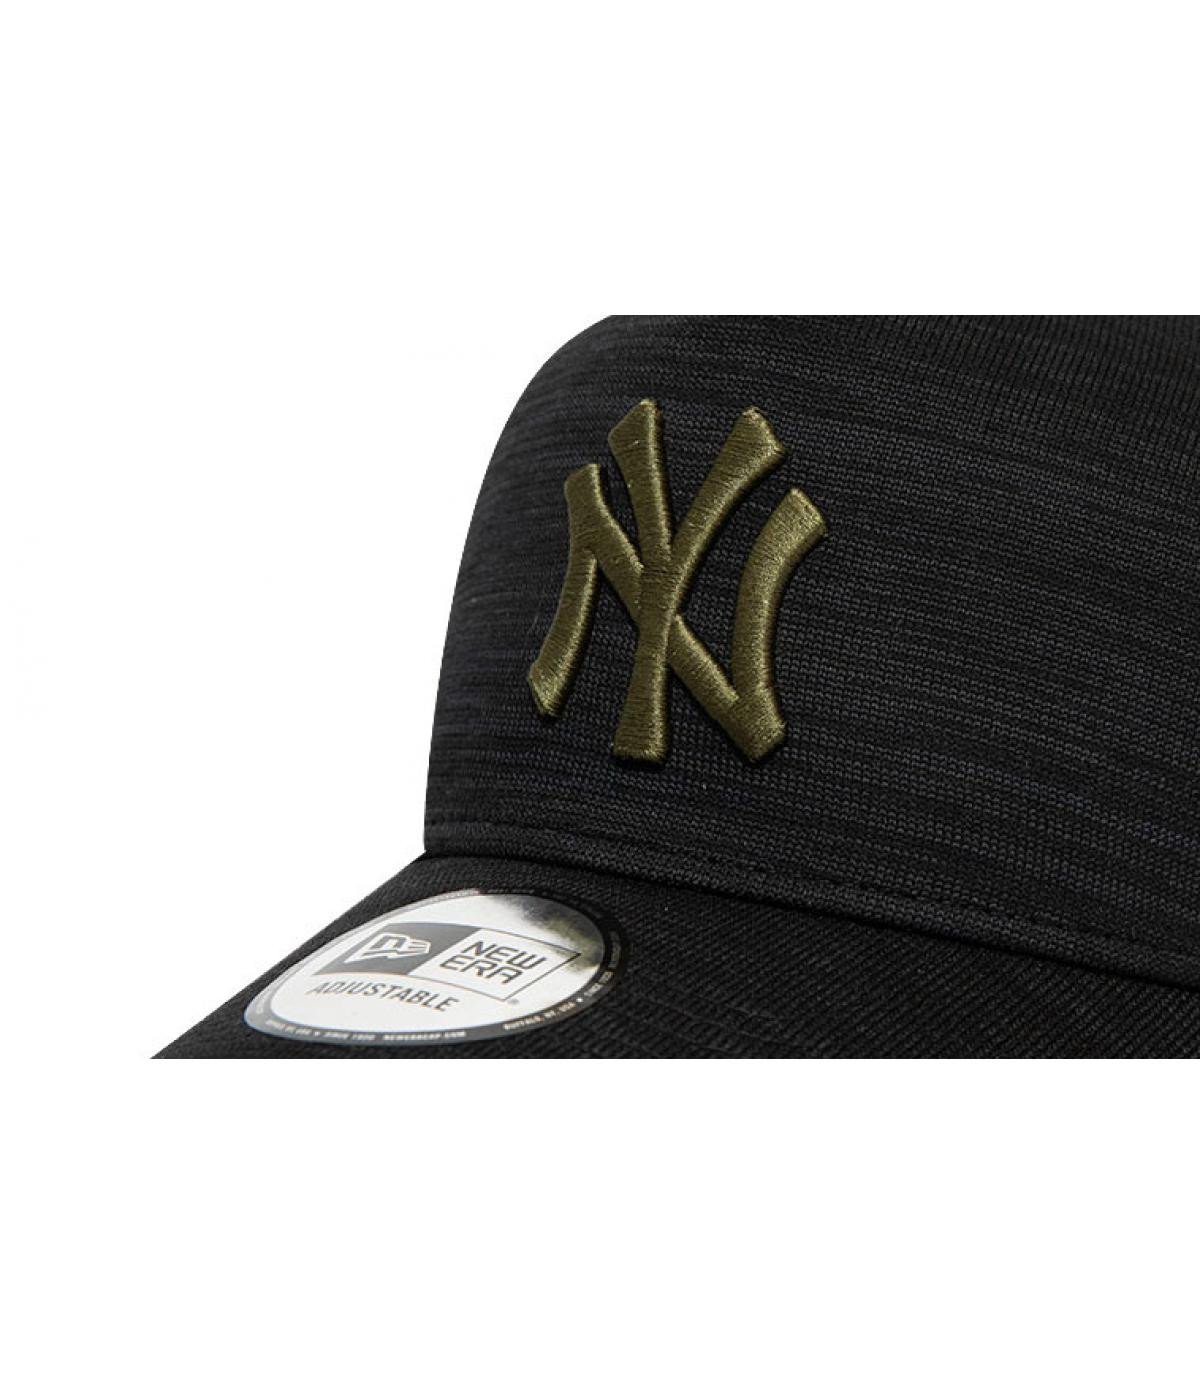 Details Cap Engineered Fit NY Aframe black olive - Abbildung 3